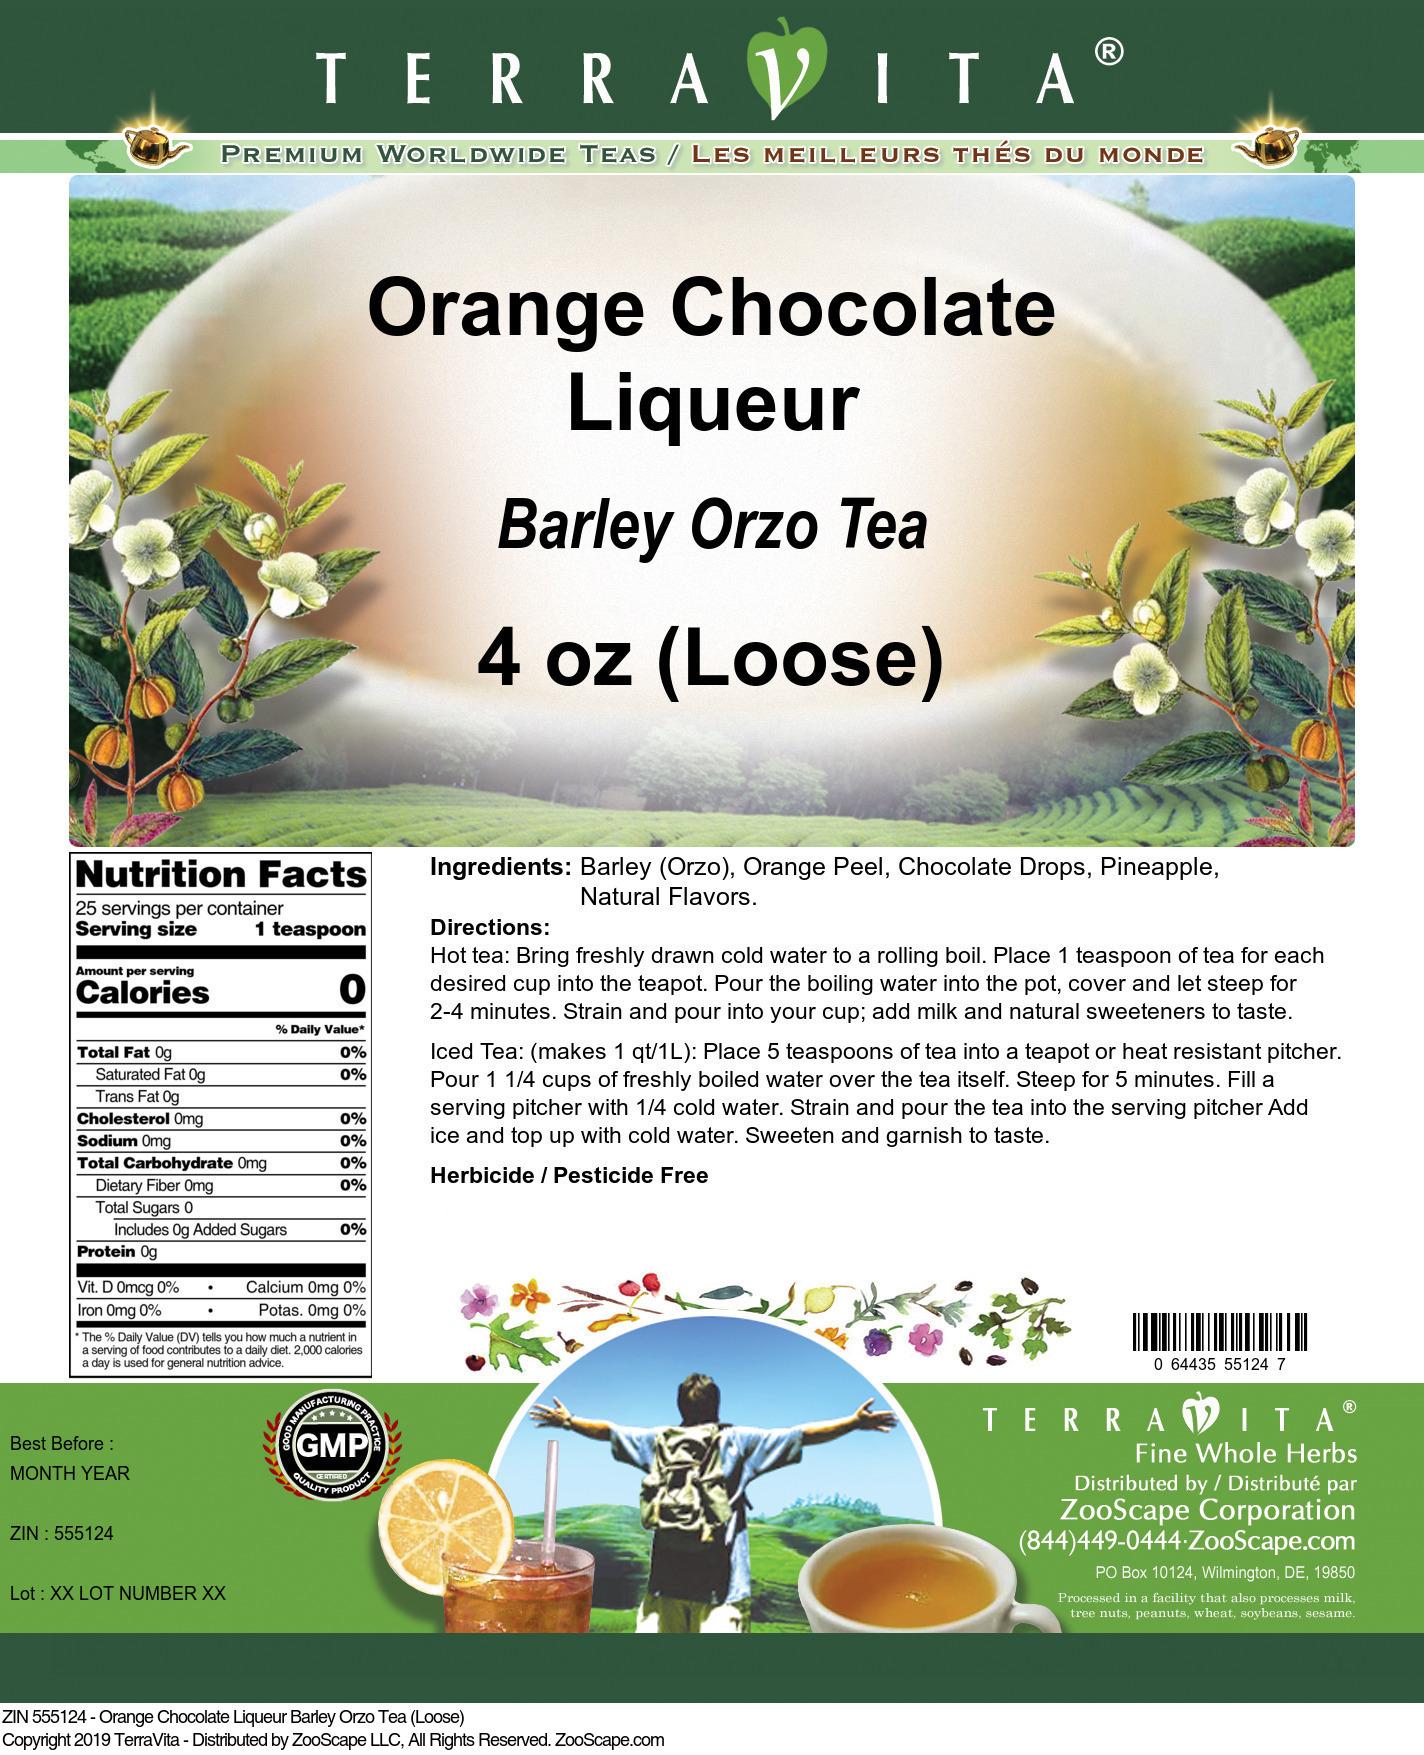 Orange Chocolate Liqueur Barley Orzo Tea (Loose)